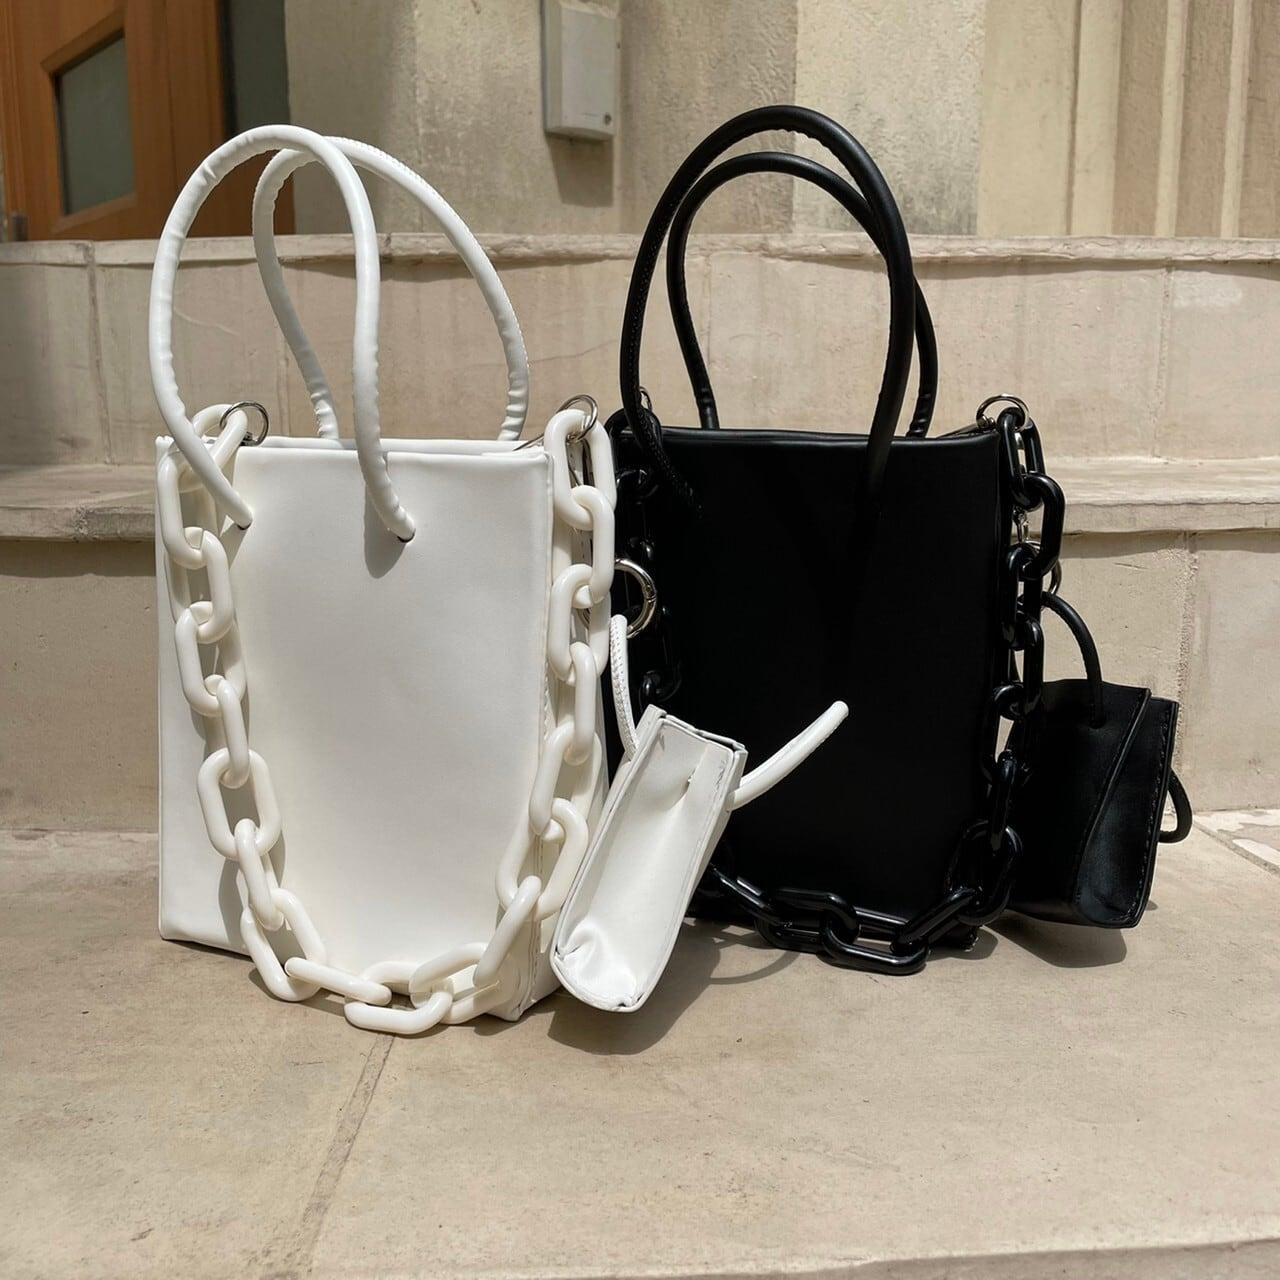 【Belle】LAST2 square chain bag / white